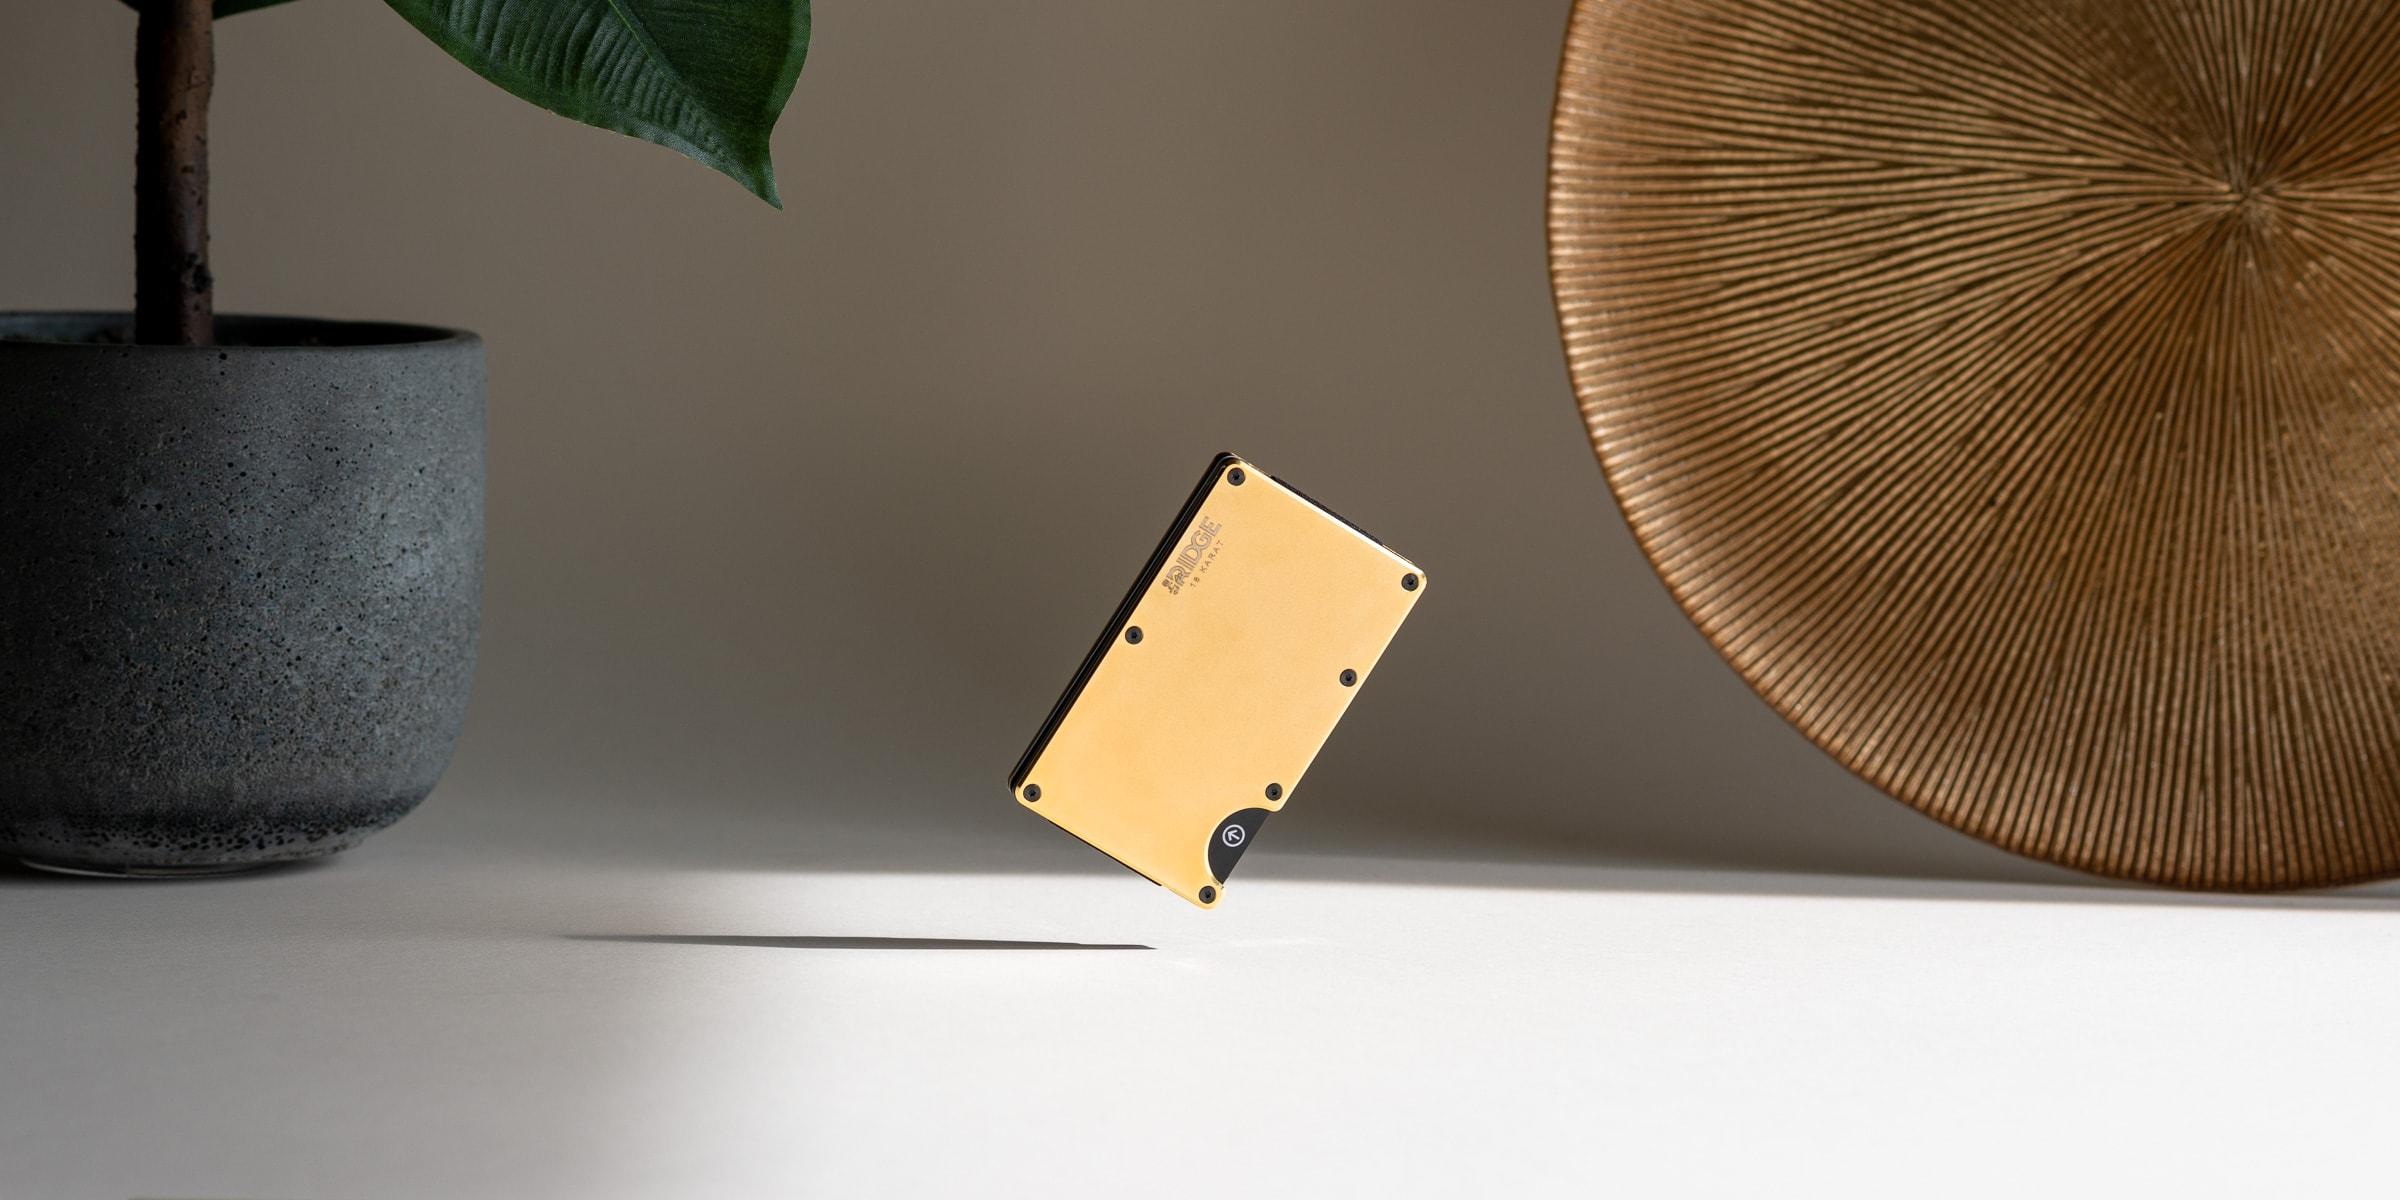 ridge wallet review - Luxe Digital